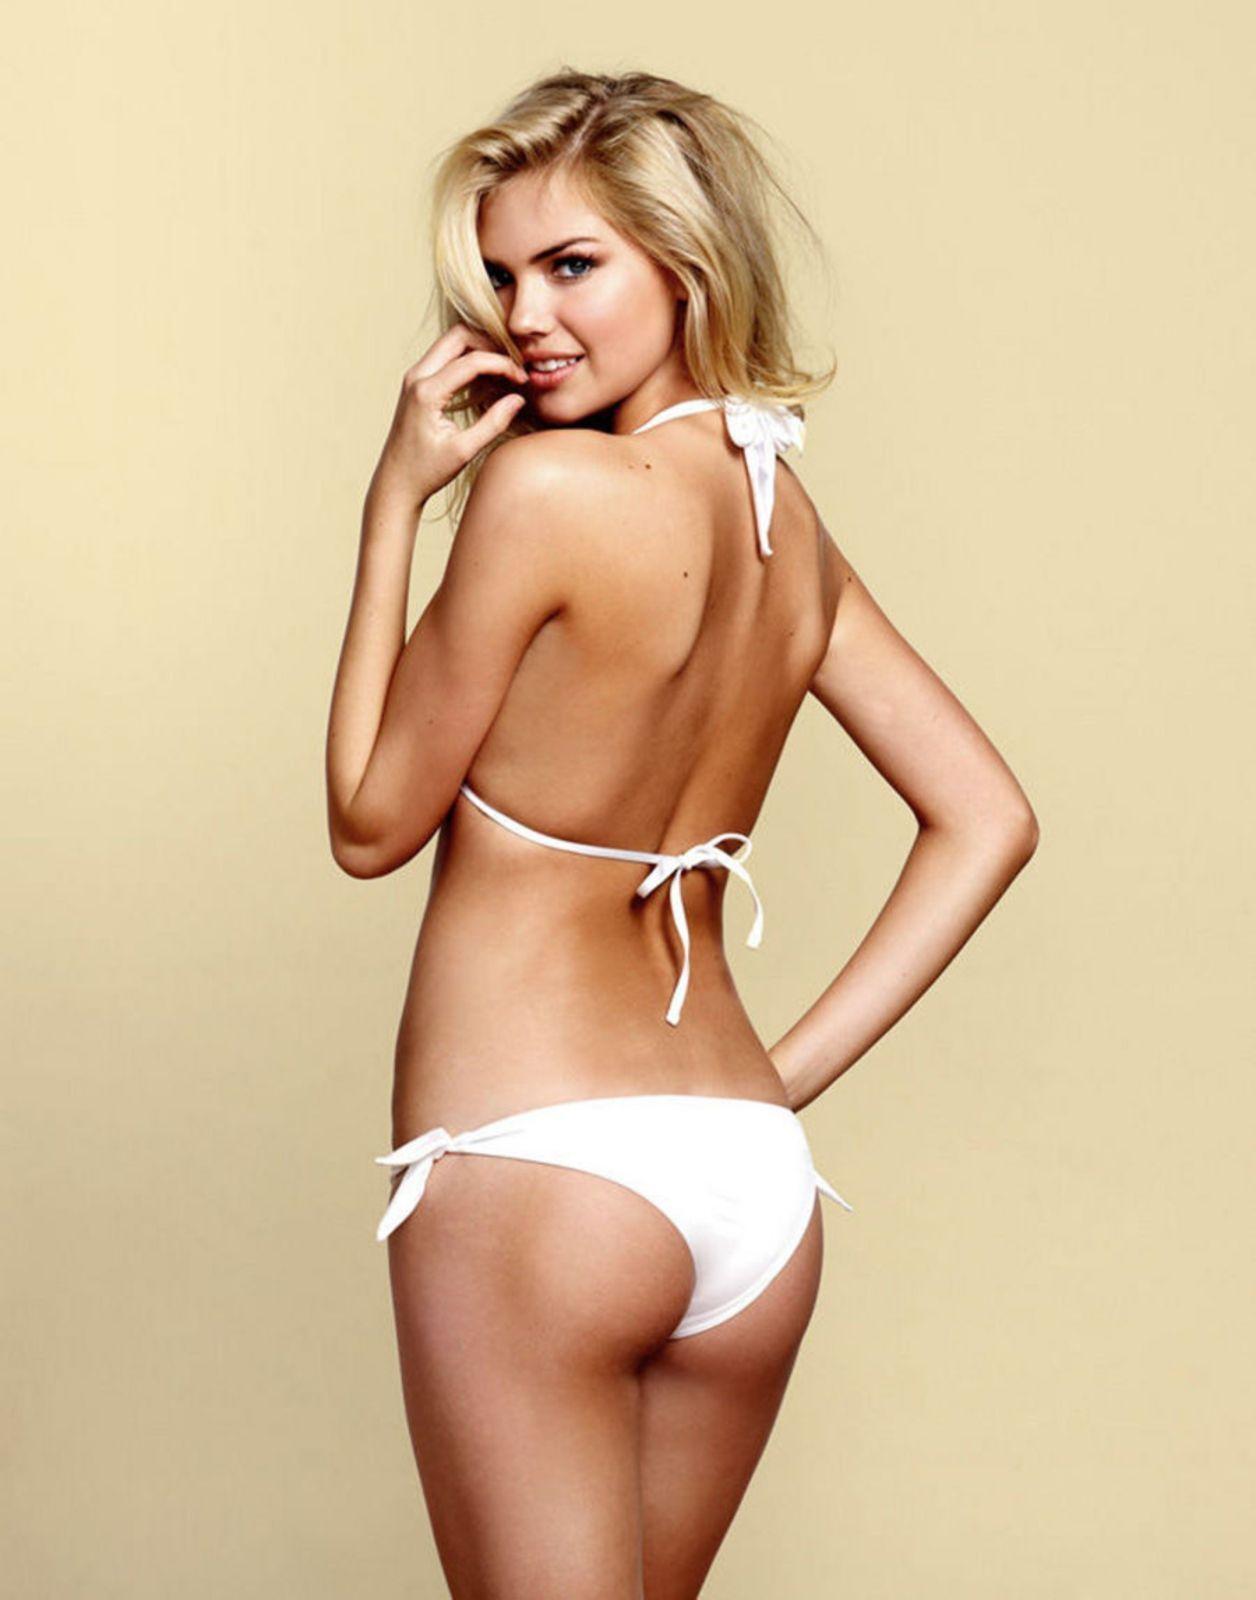 http://3.bp.blogspot.com/-J2Xybw6mBNY/TZ0wanUJgEI/AAAAAAAAAlg/8jd1hLauo28/s1600/Kate-Upton-White-Bikini-8.jpg